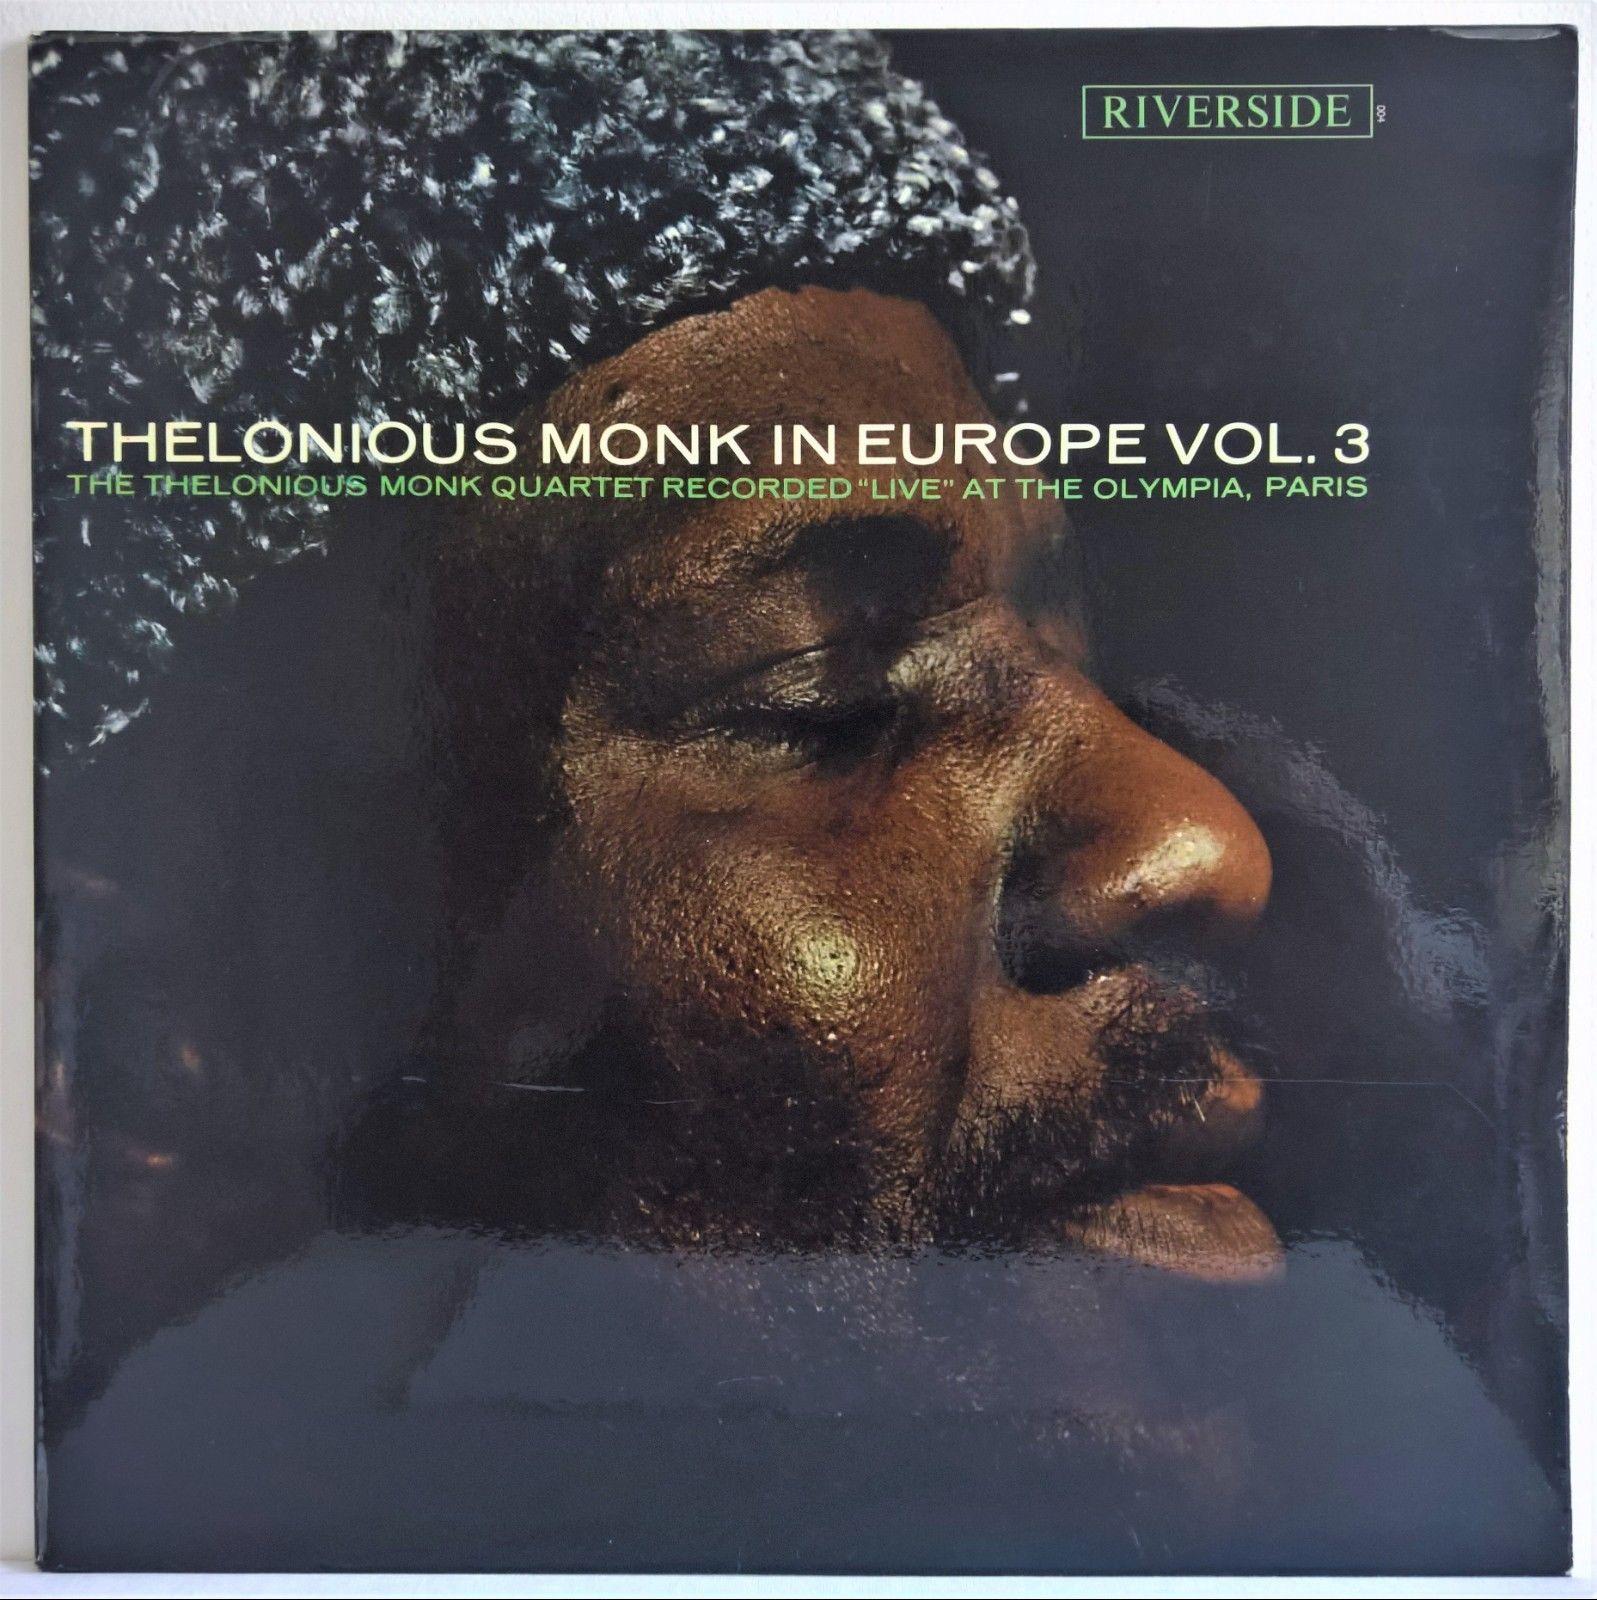 Thelonious Monk - In Europe vol. 3 – Riverside – Original France – MINT